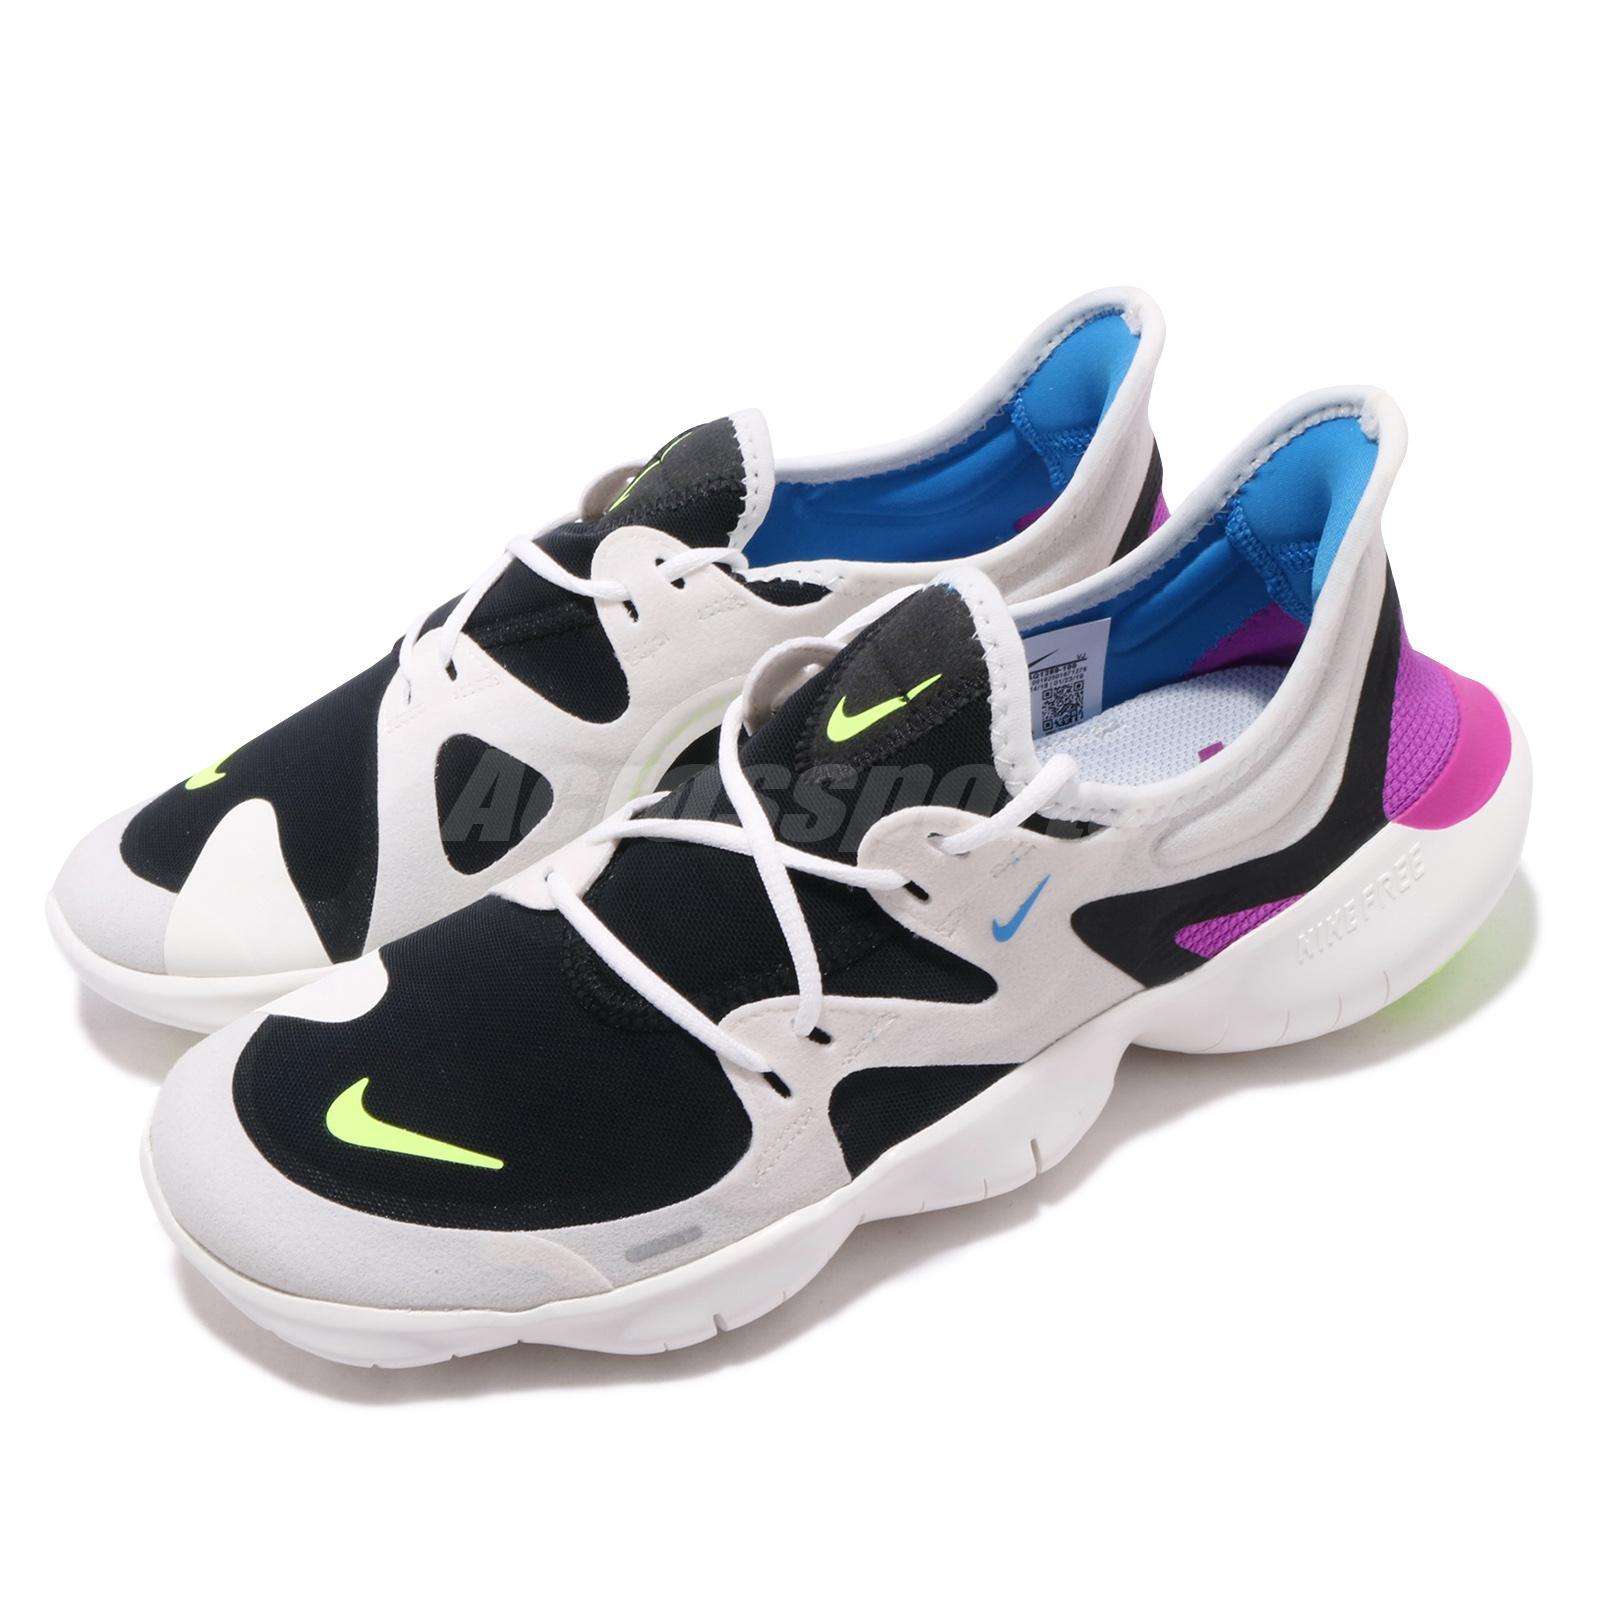 614e5308ce98e Details about Nike Free RN 5.0 White Black VOlt Purple Mens Running Shoes  Run AQ1289-100